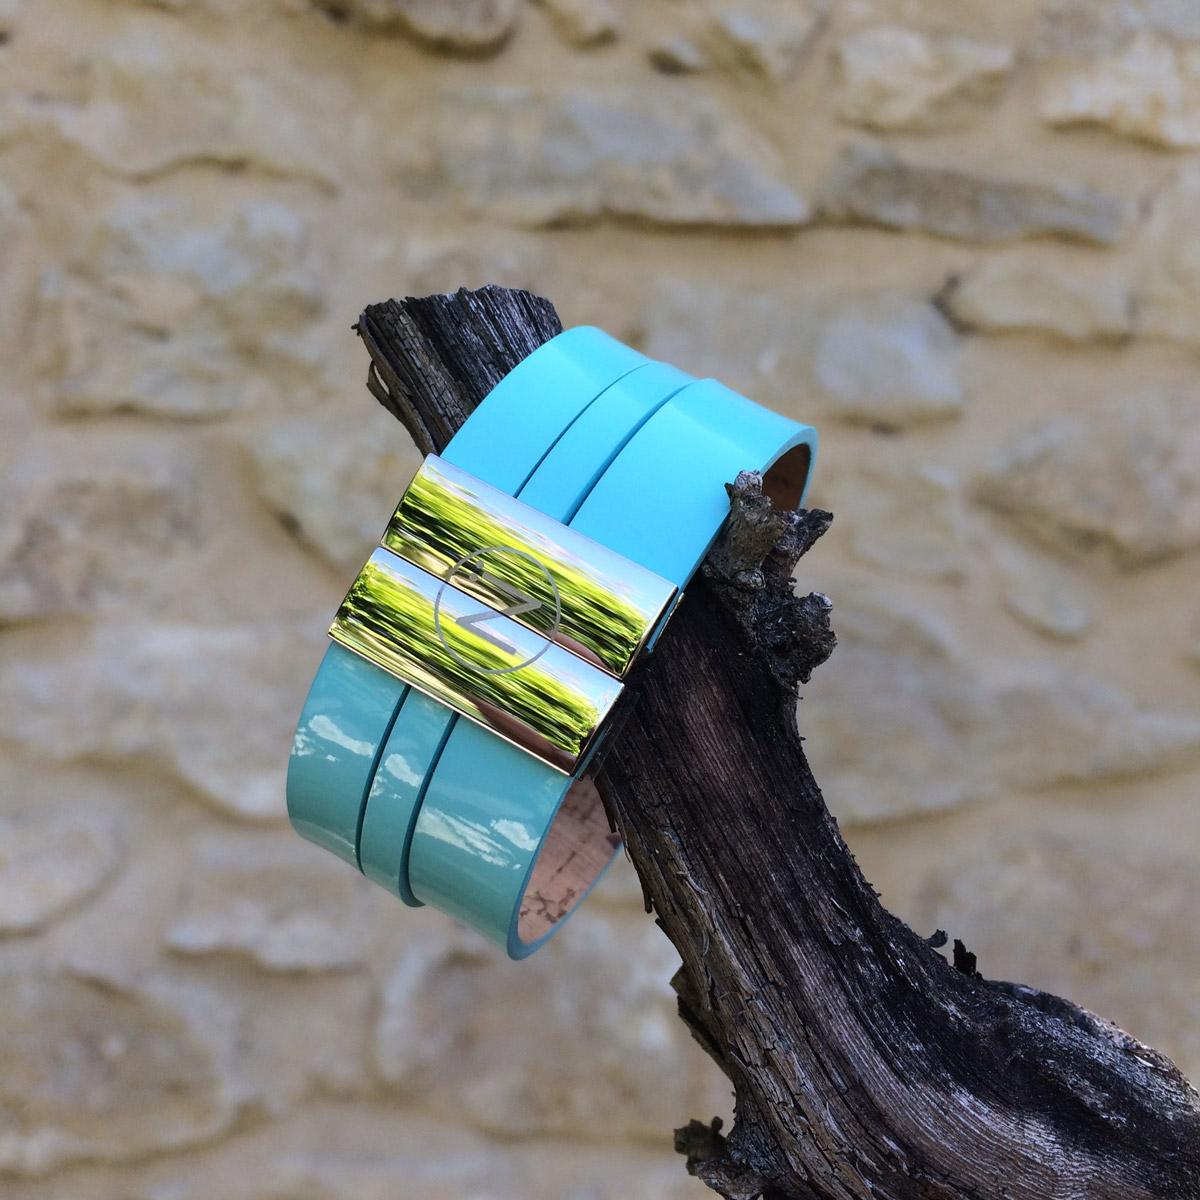 ninti bangle cuff bracelet leather eco friendly cork fashion made in france handcrafting